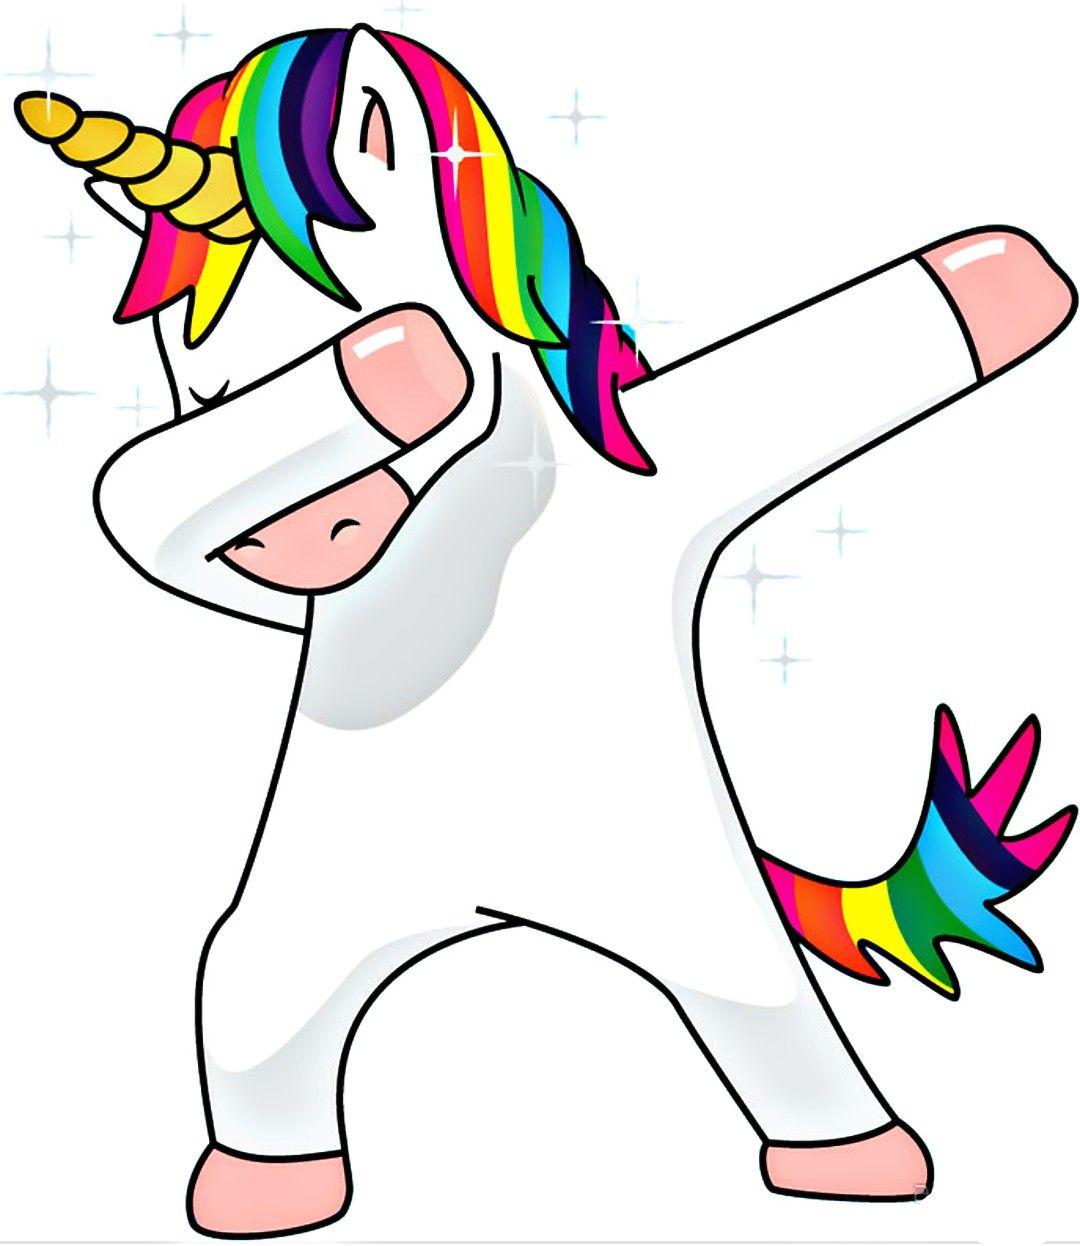 Unicorn dabbing wallpaper de unic rnio papeis de parede unicornio e papeis de parede tumblr - Unicorn dabbing pictures ...